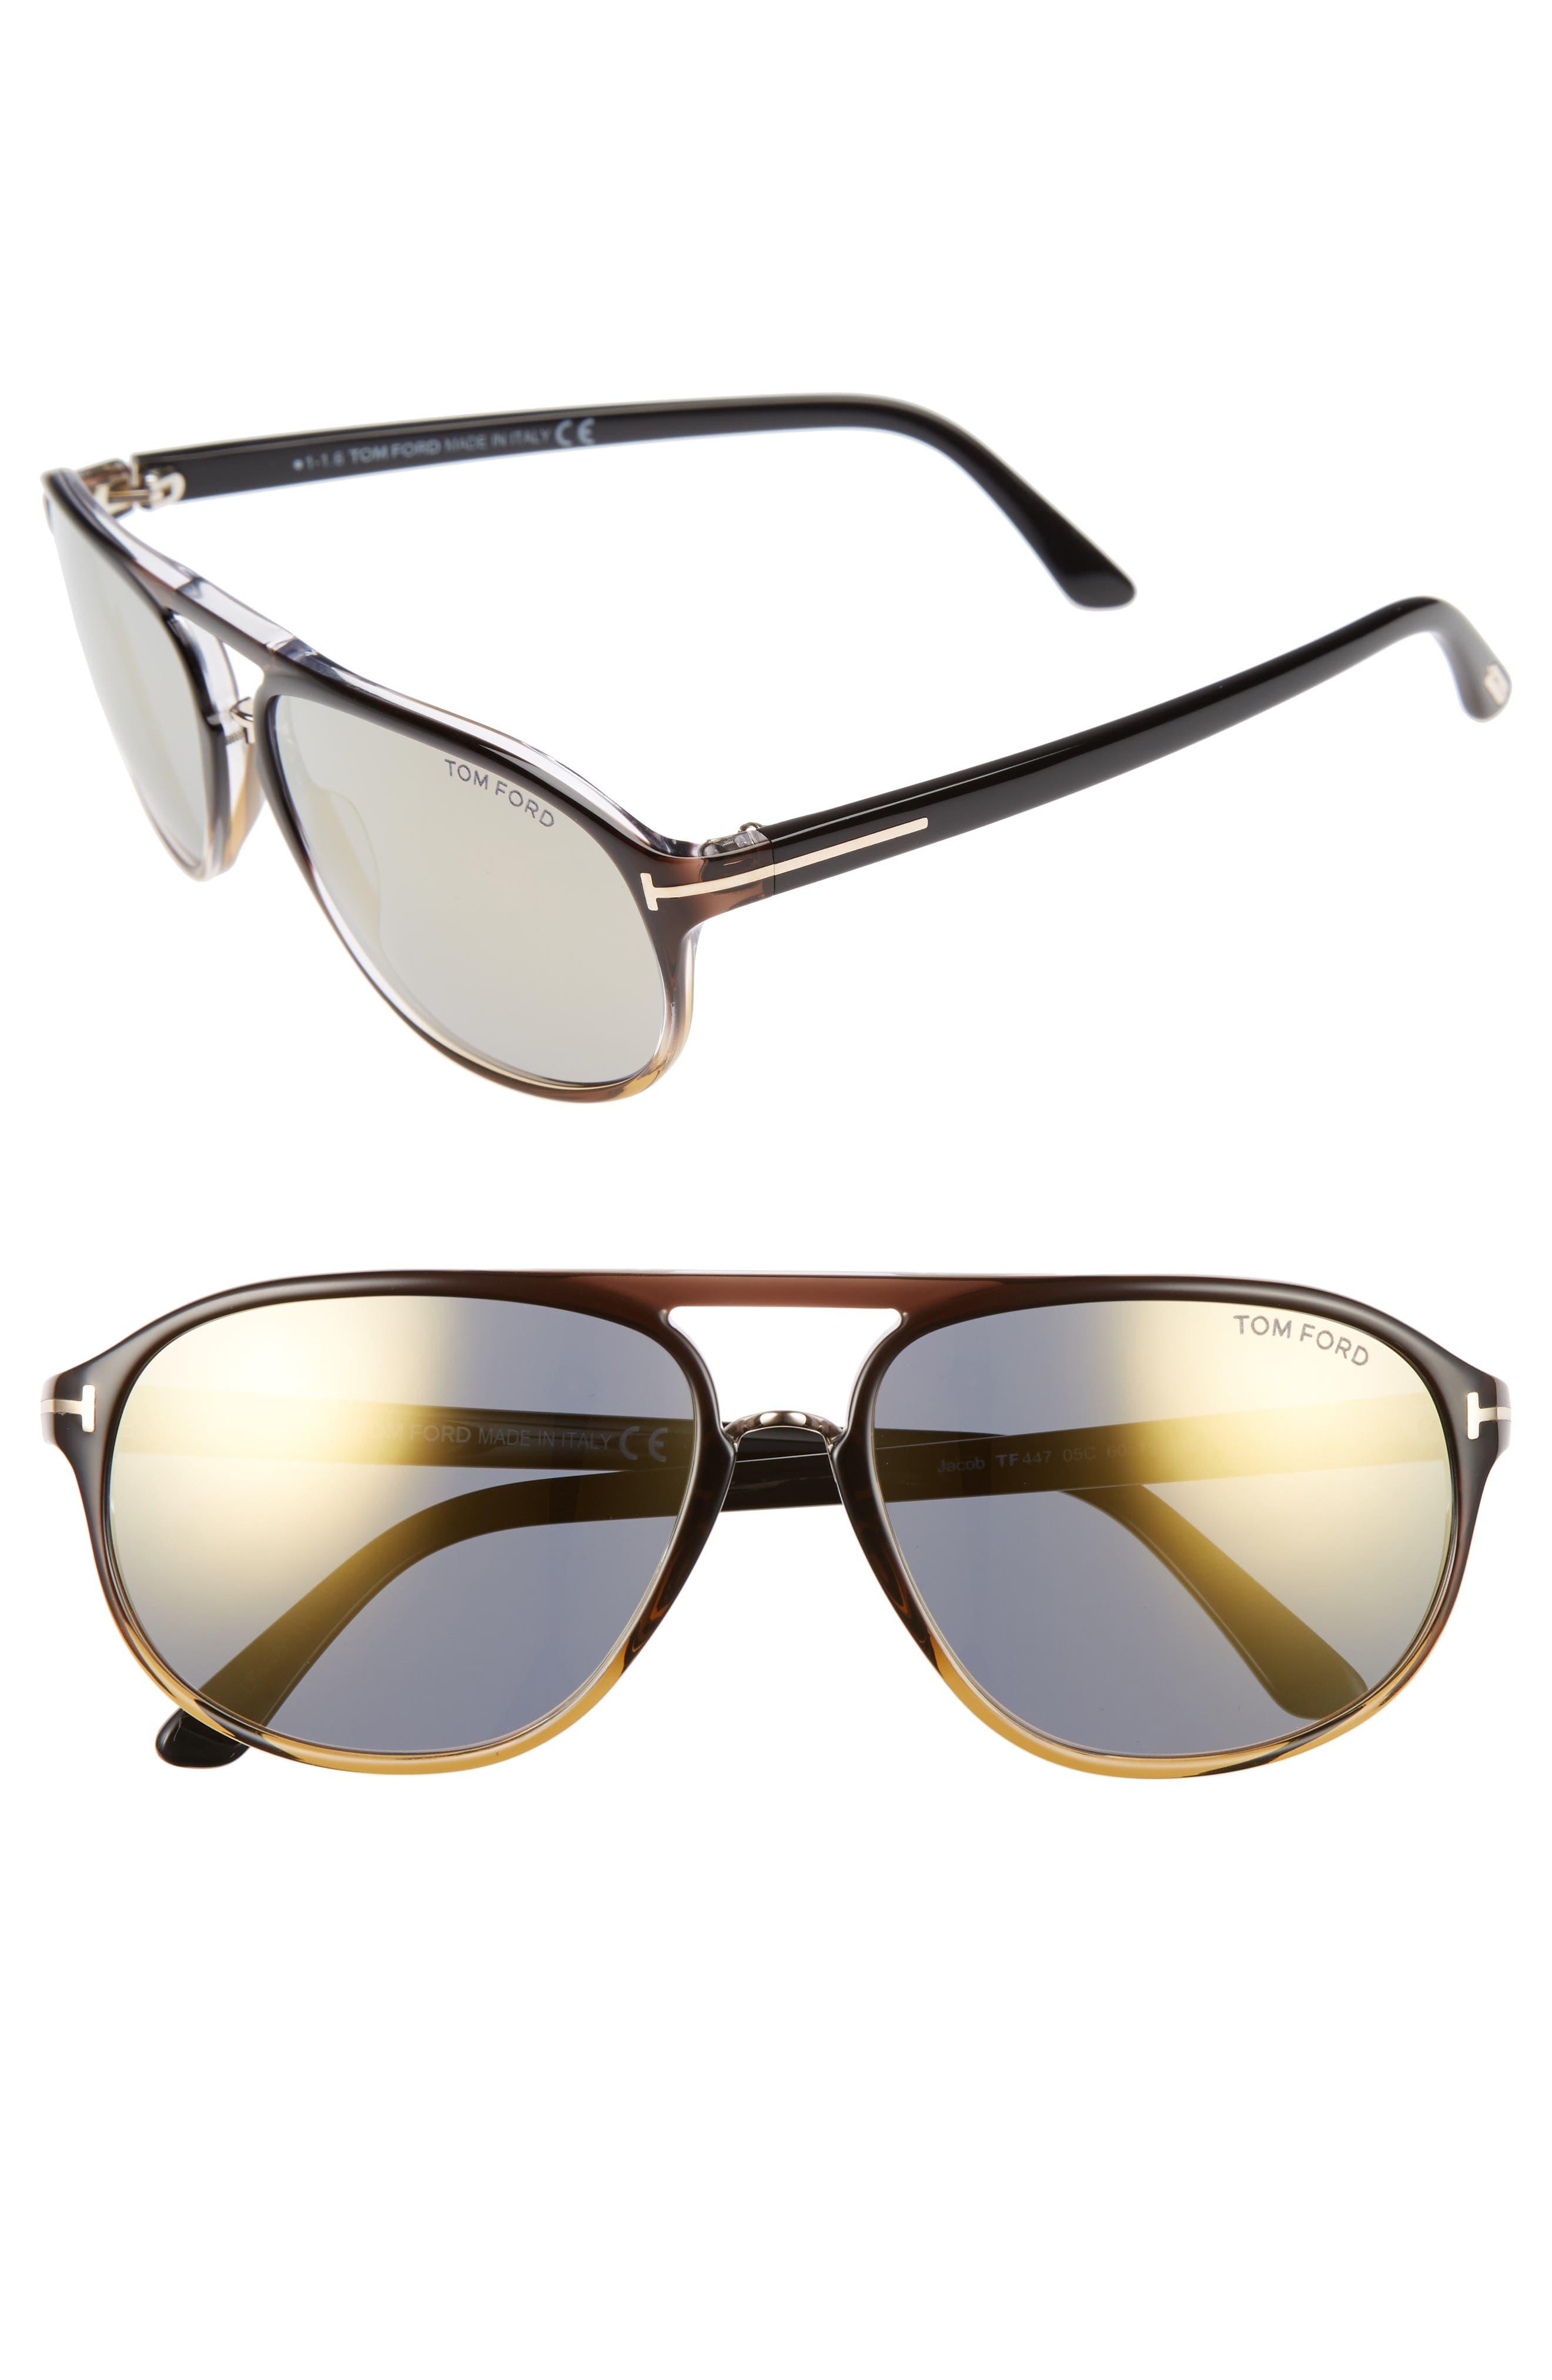 Jacob 60mm Retro Sunglasses,                             Main thumbnail 1, color,                             Black/ Other/ Smoke Mirror